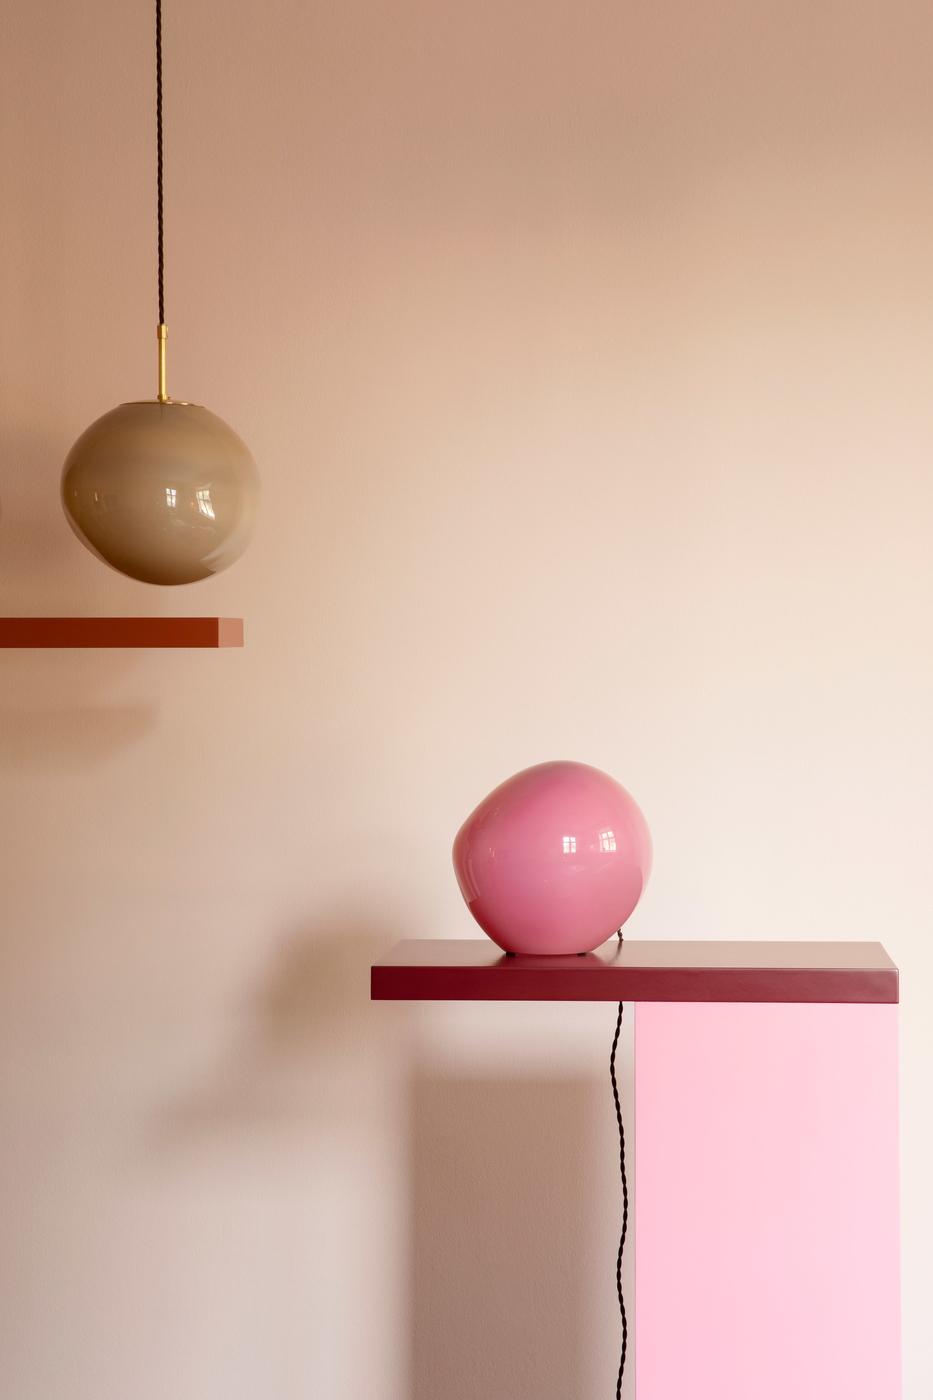 candy-light-collection-helle-mardahl-design_dezeen_2364_col_3.jpg